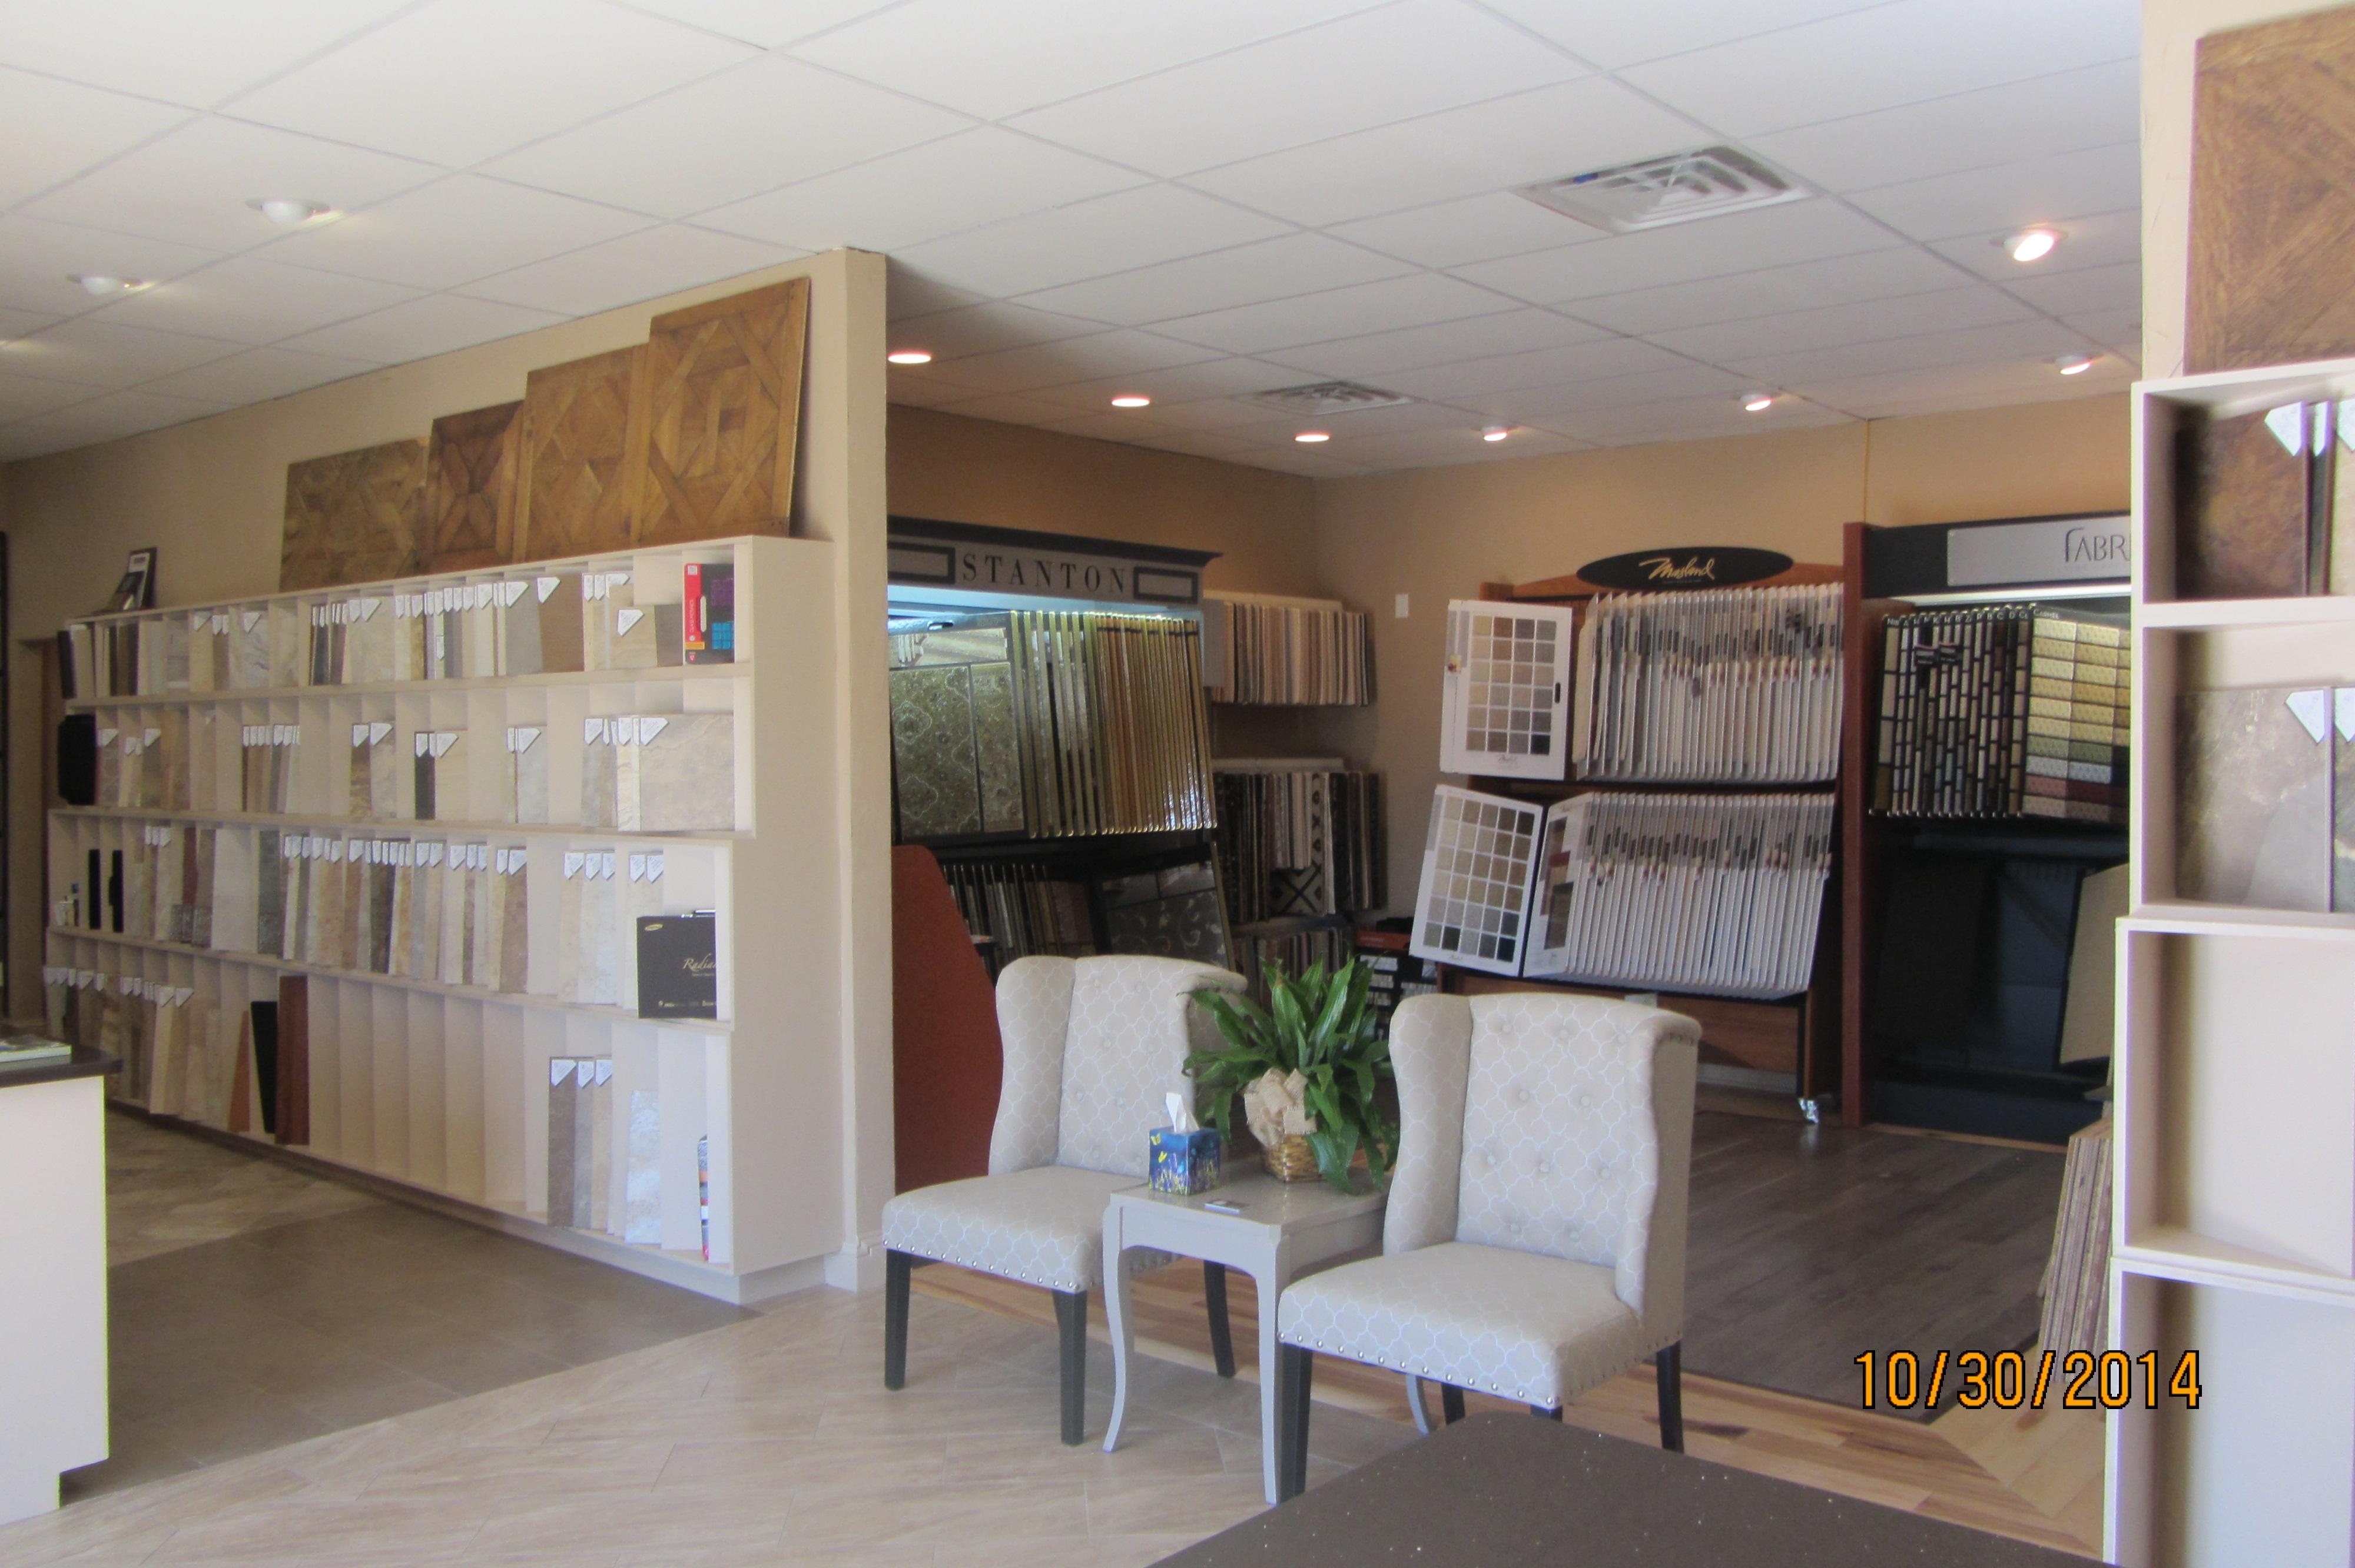 Flooring Inspirations Texas E Northwest Hwy Grapevine TX - Daltile grapevine